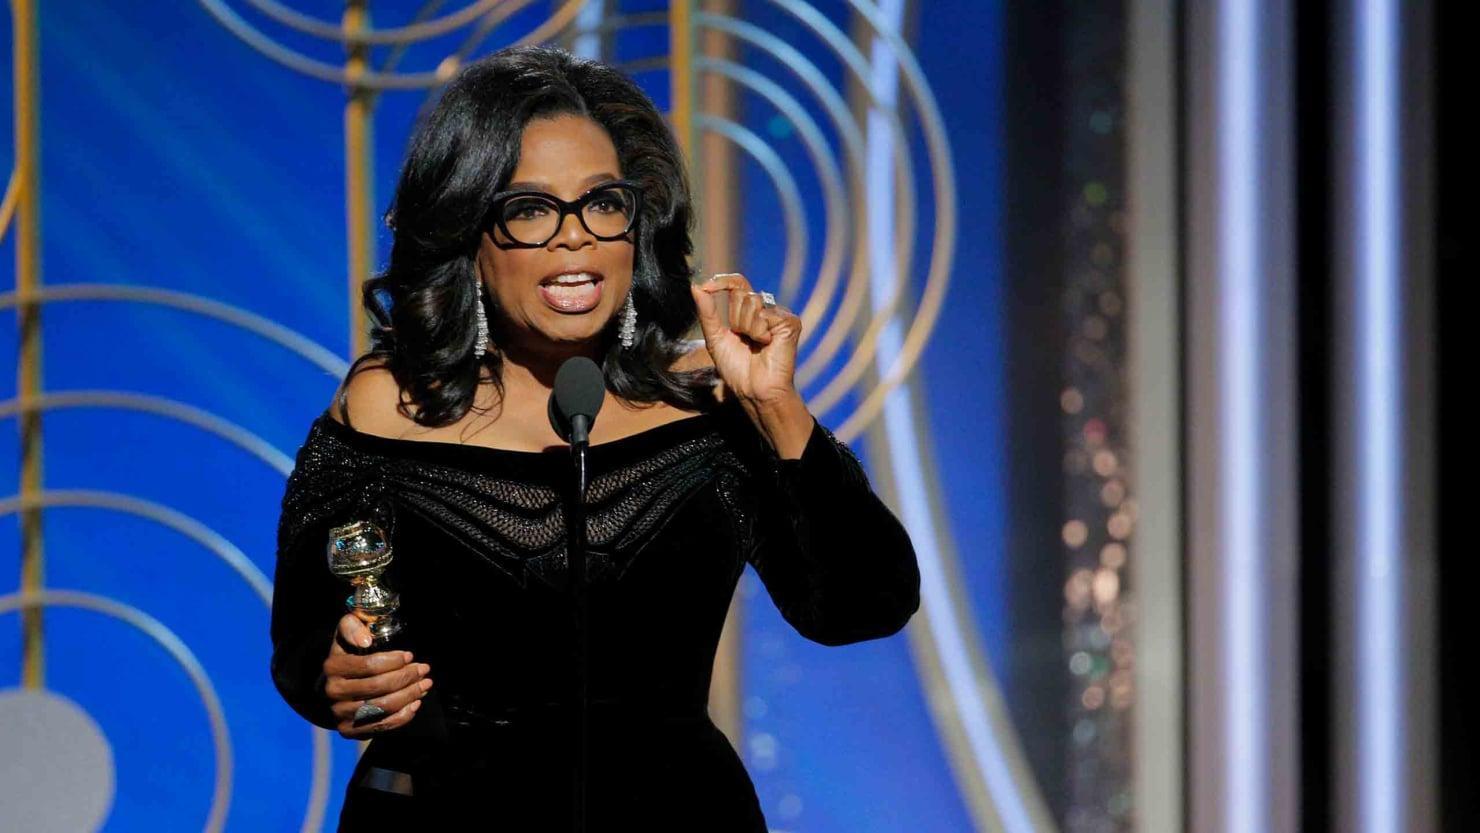 Oprah Winfrey at the Golden Globe Awards